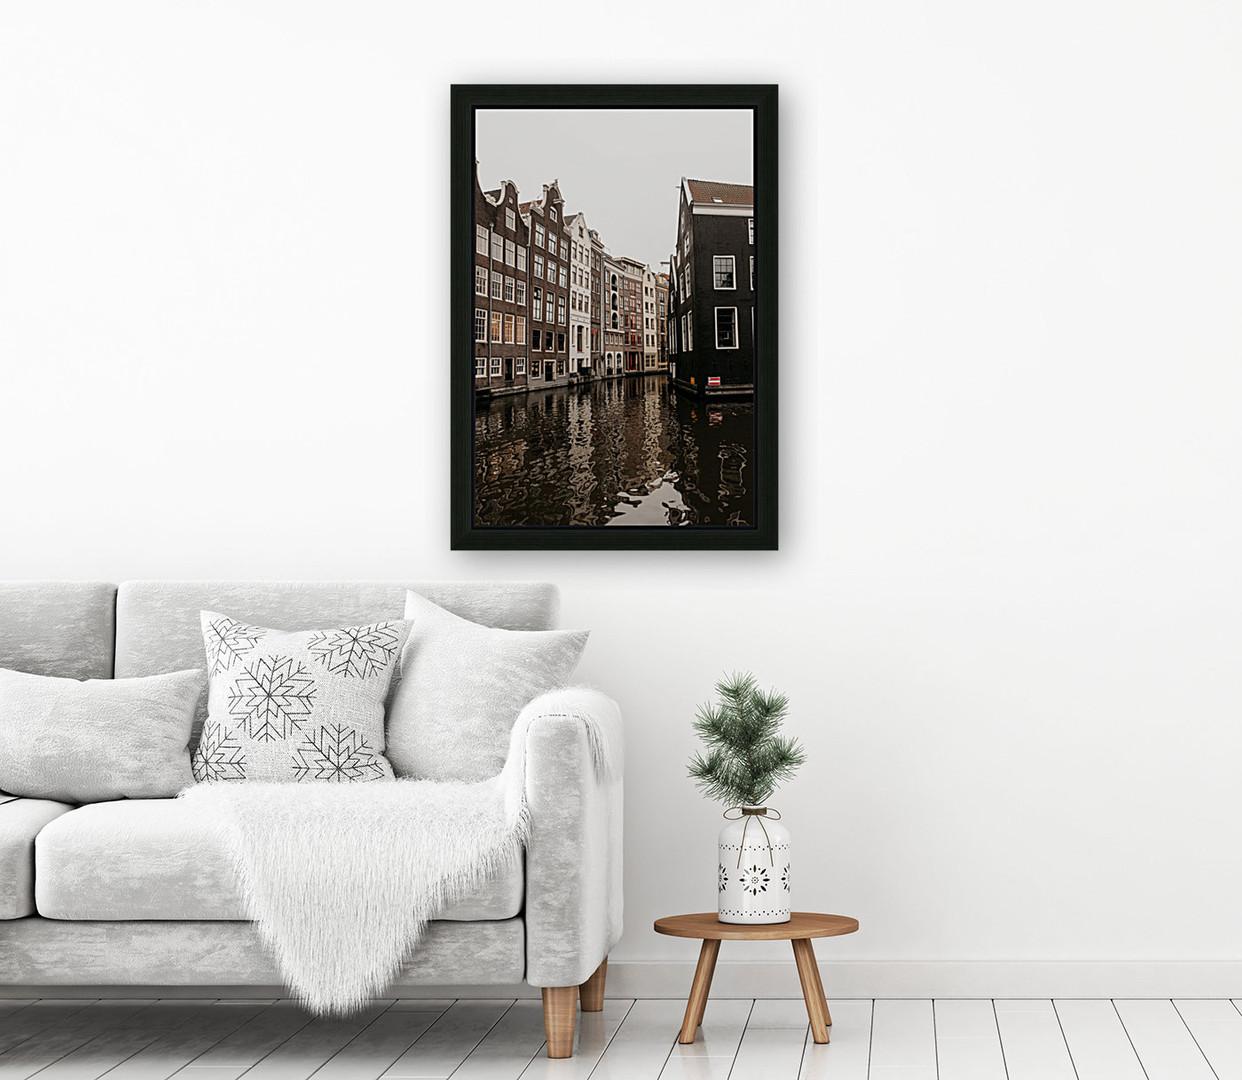 Amsterdam Photography Store framedbyemily.com